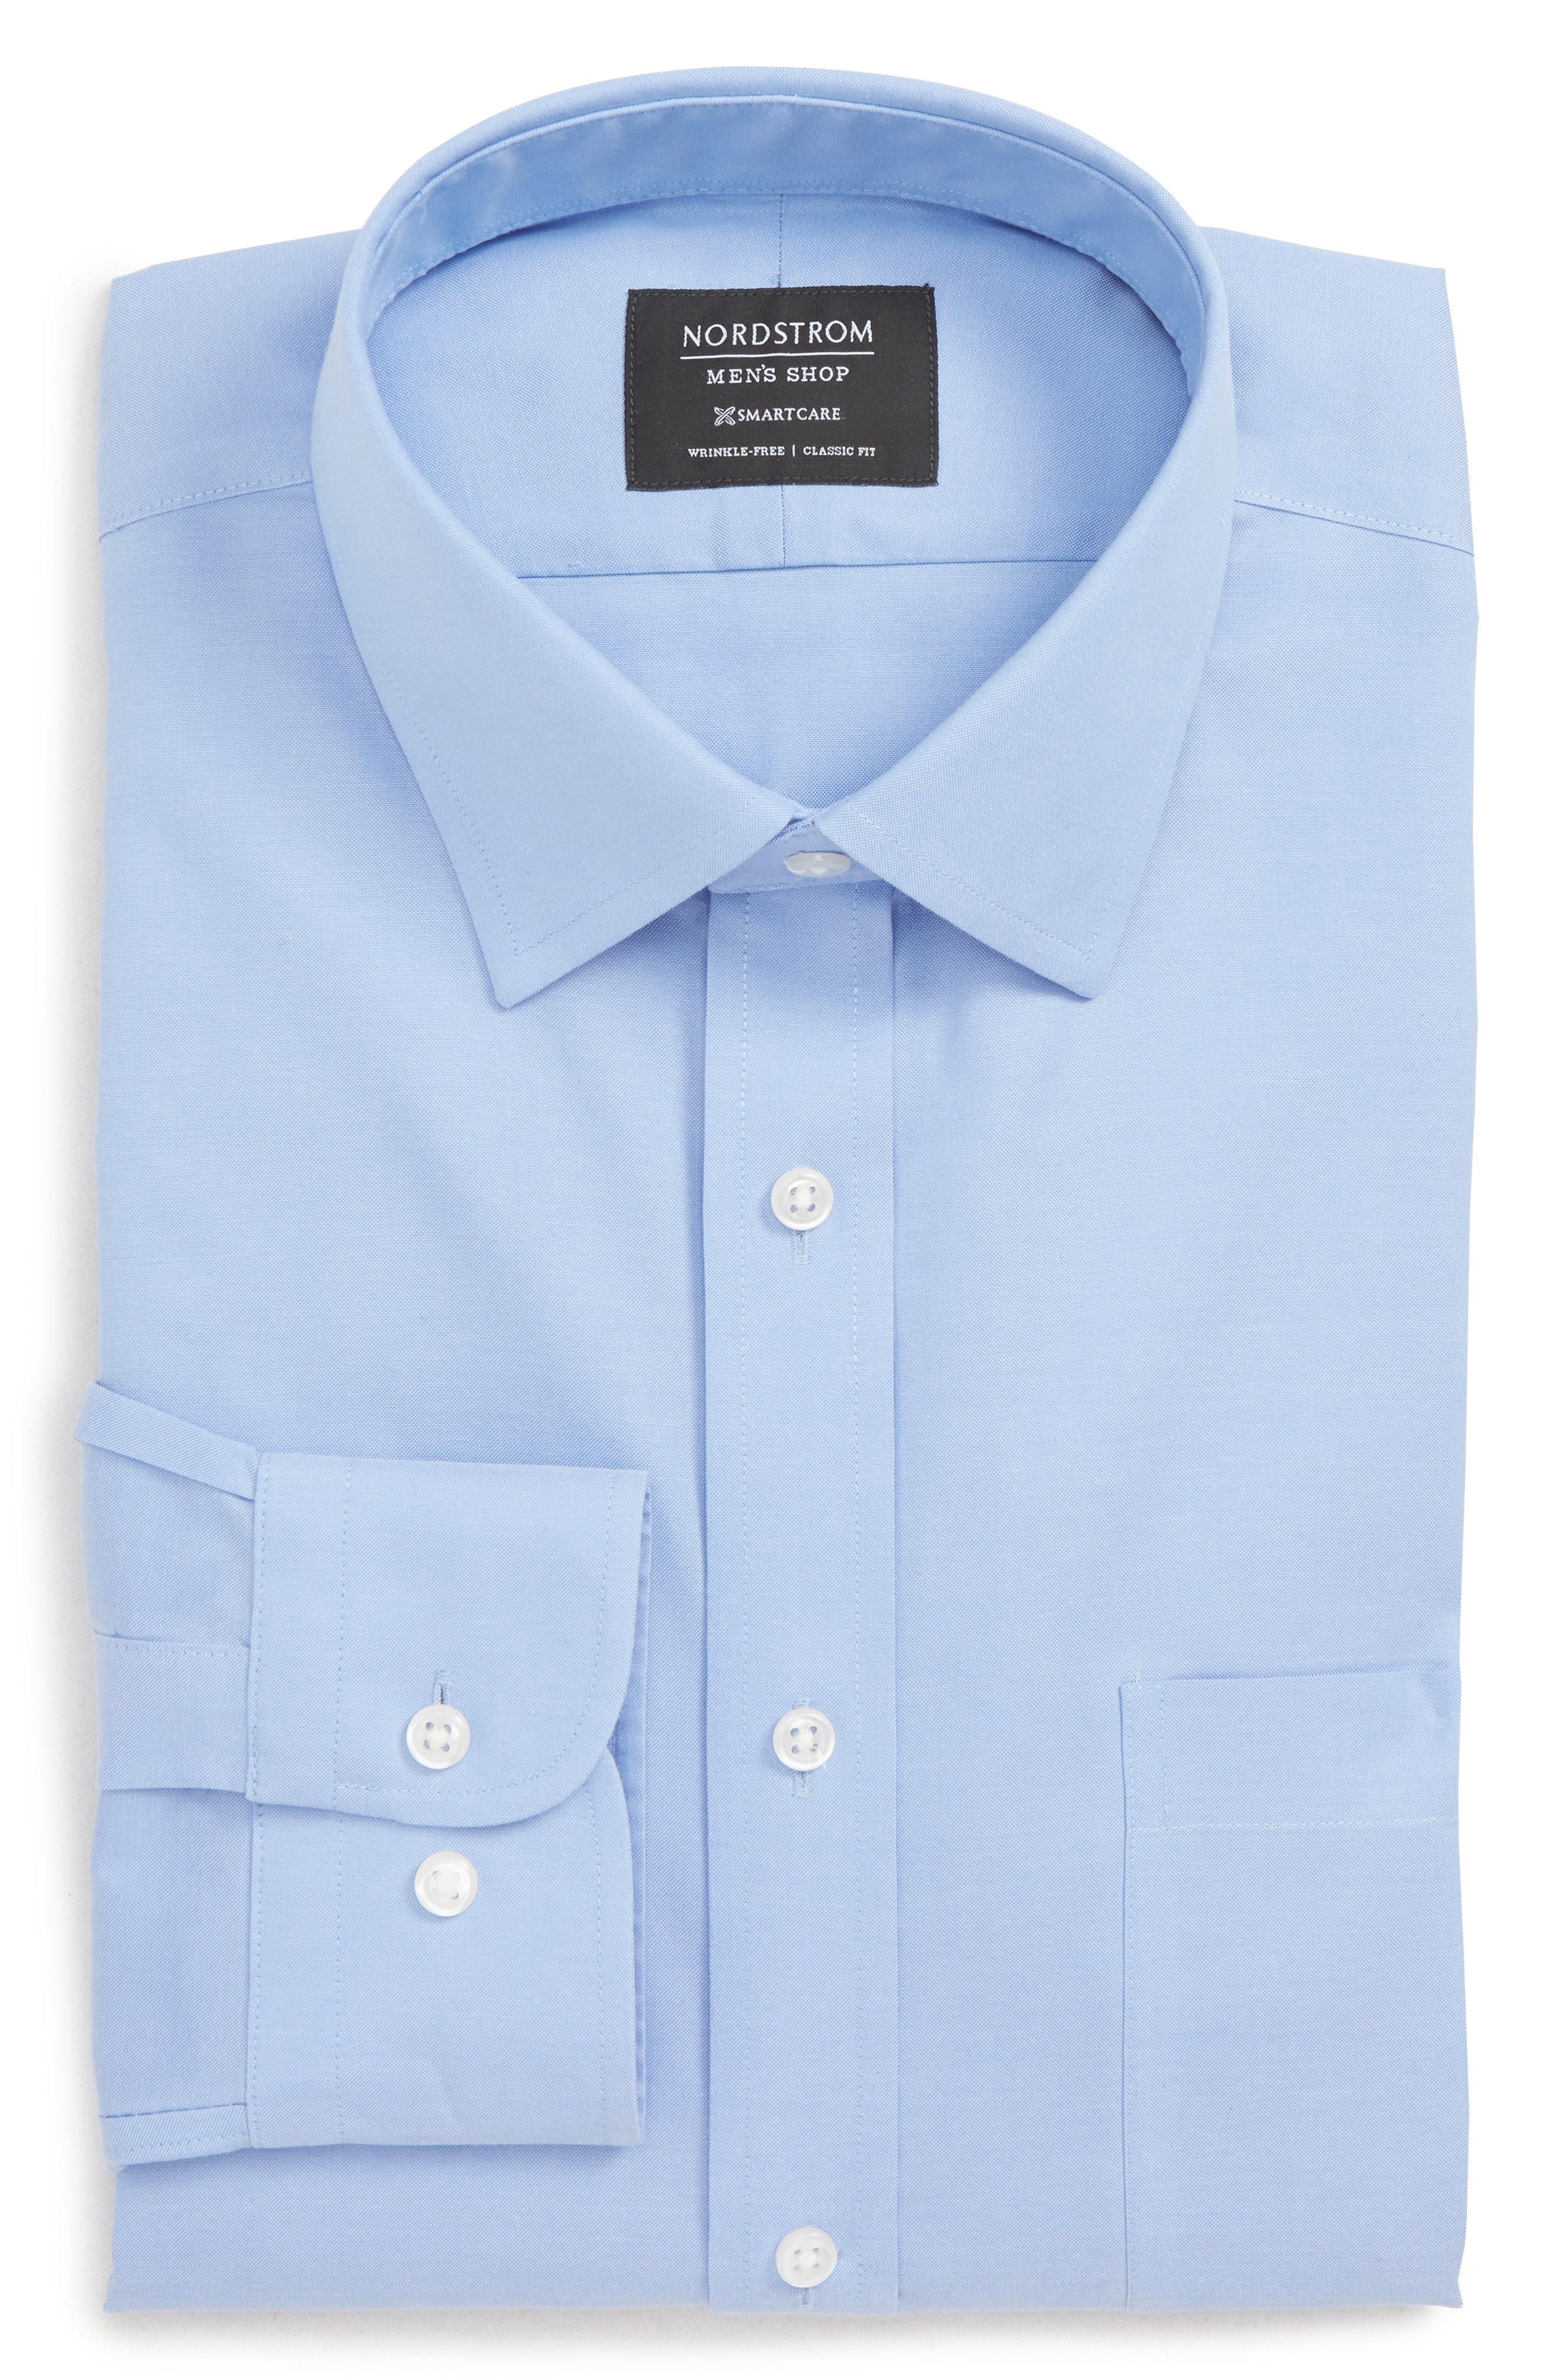 Nordstrom Men's Shop Smartcare Classic Fit Solid Dress Shirt (Online Only)